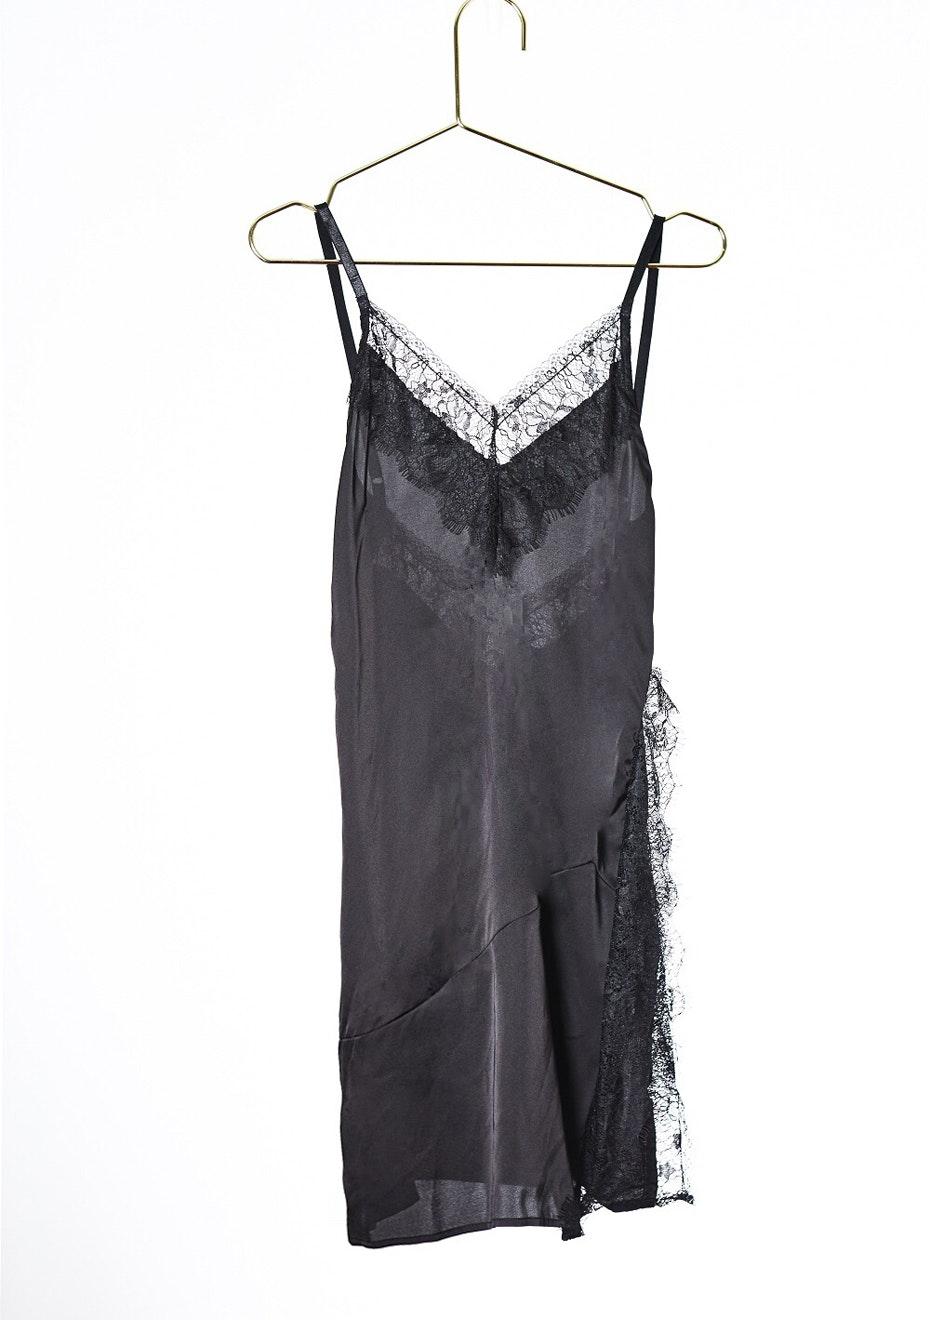 SO LONG LACE DRESS - BLACK